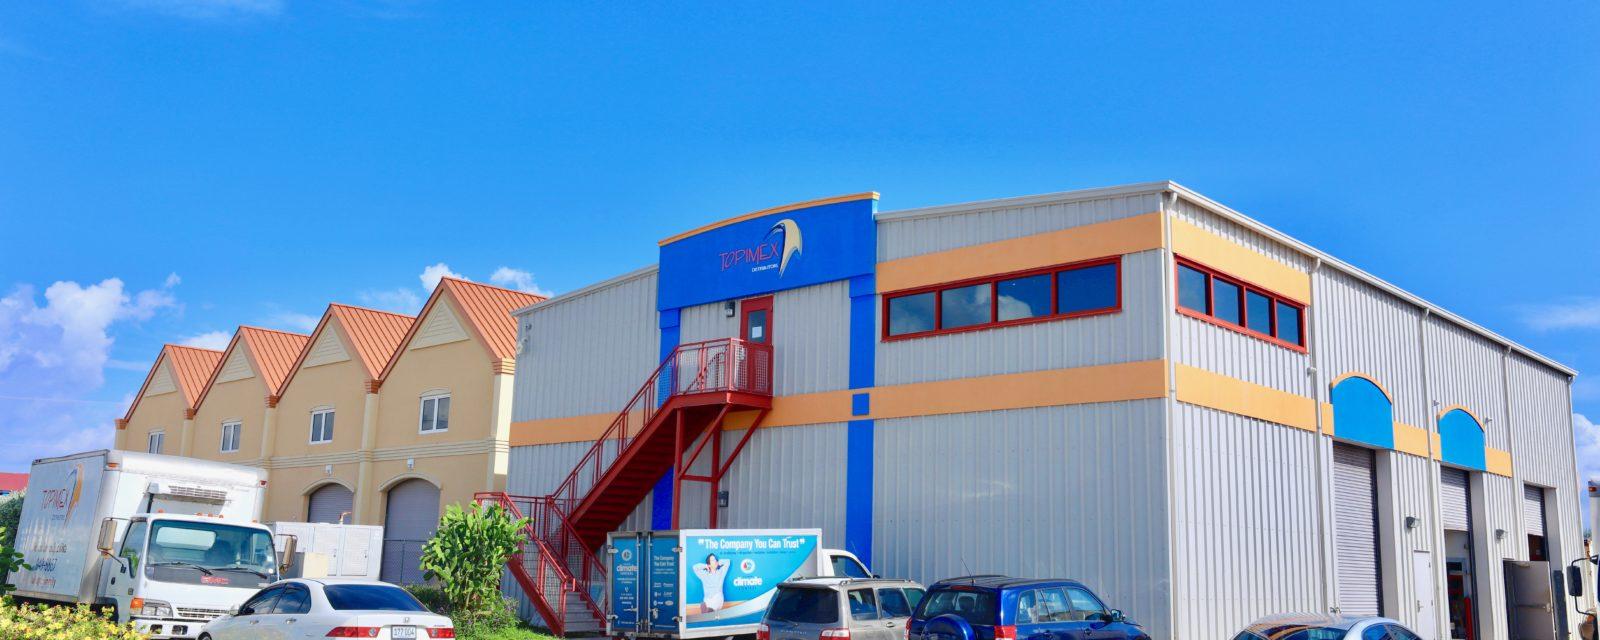 Seamist Building